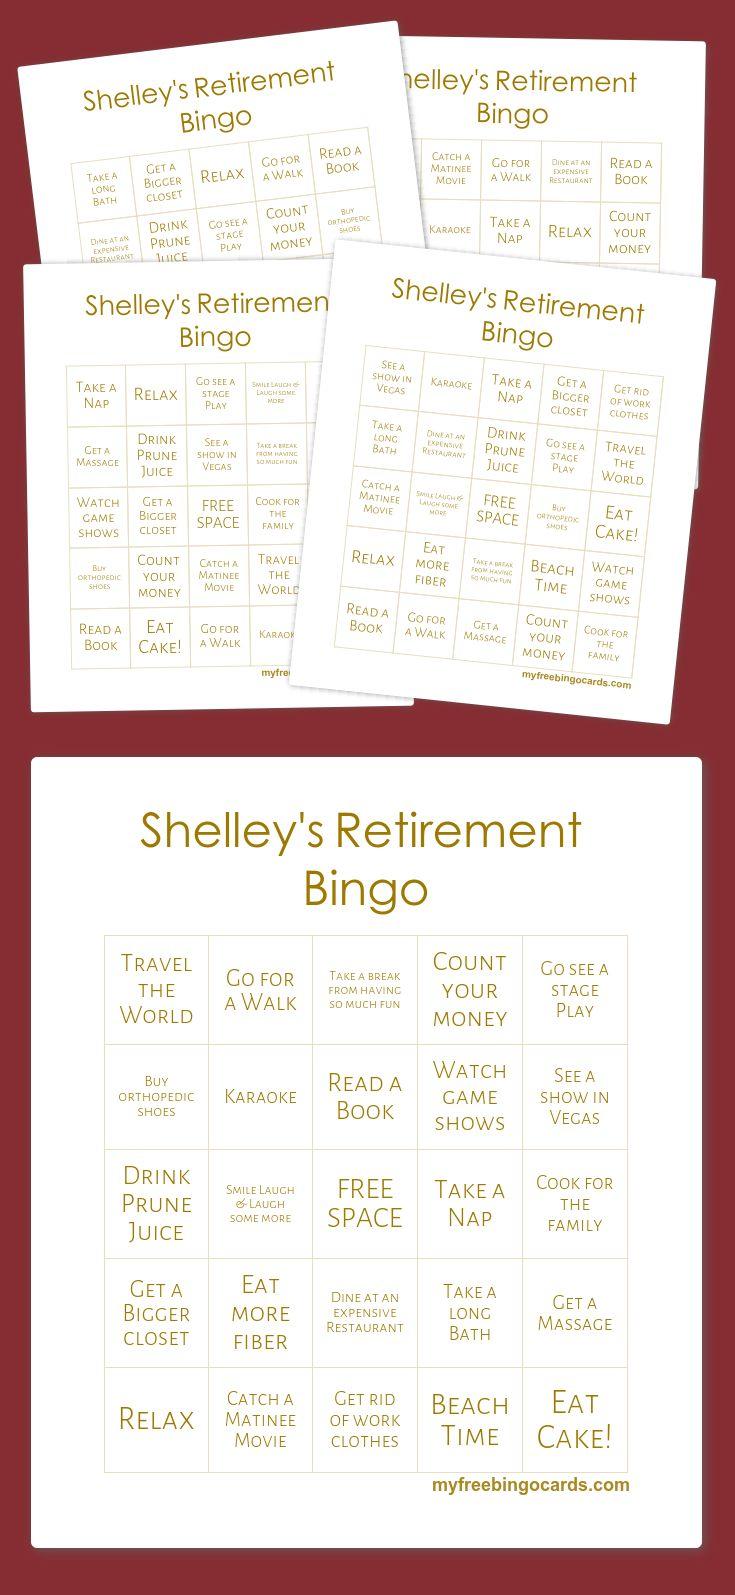 Shelley's Retirement Bingo fun games Bingo cards